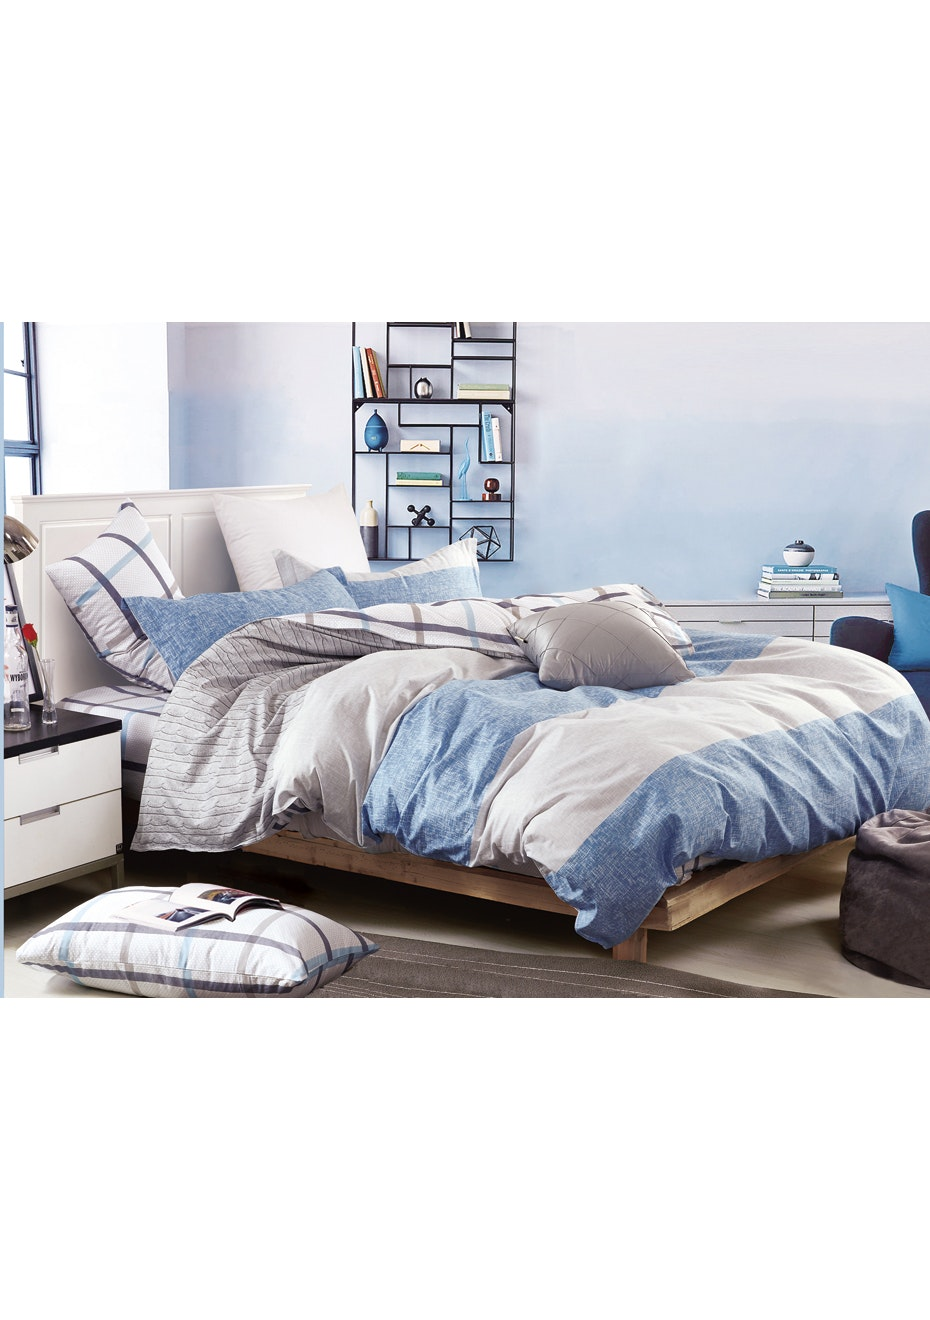 Cable Beach Quilt Cover Set - Reversible Design - 100% Cotton - Queen Bed